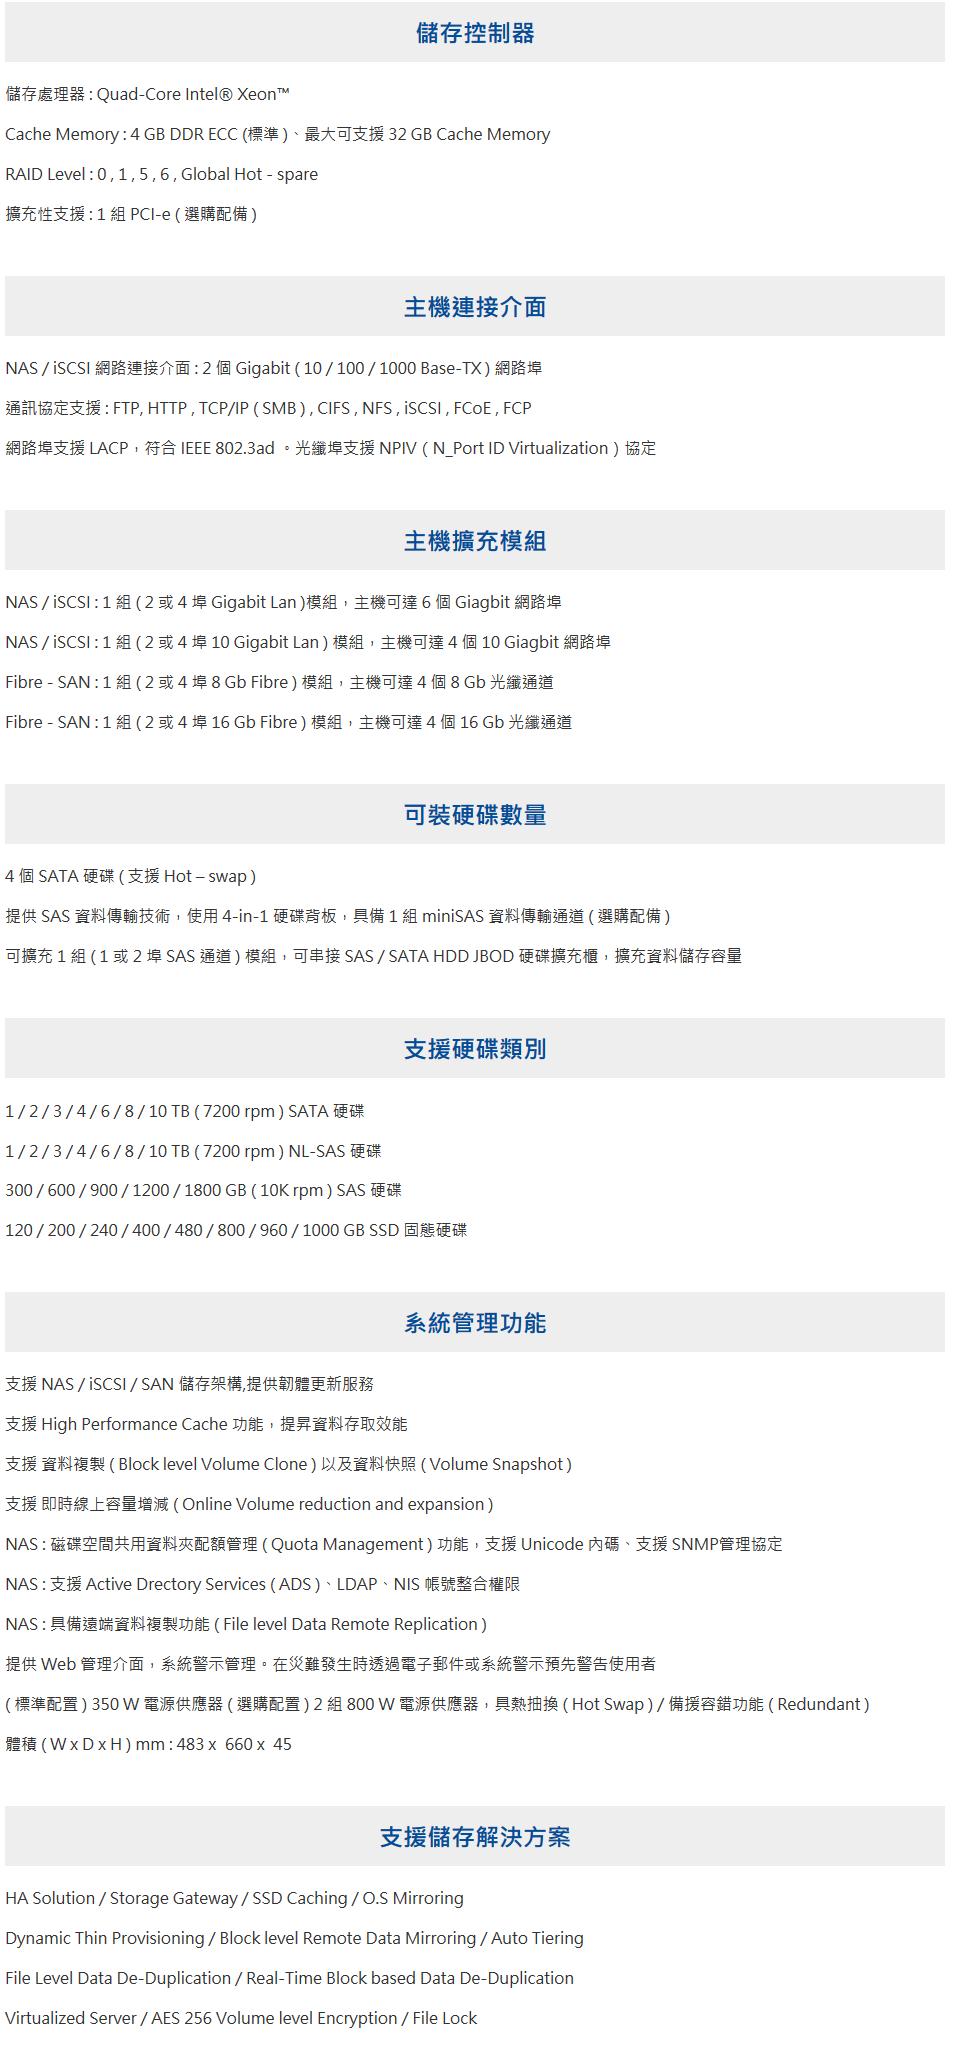 Screenshot_2019-05-17 樂高電腦股份有限公司.png